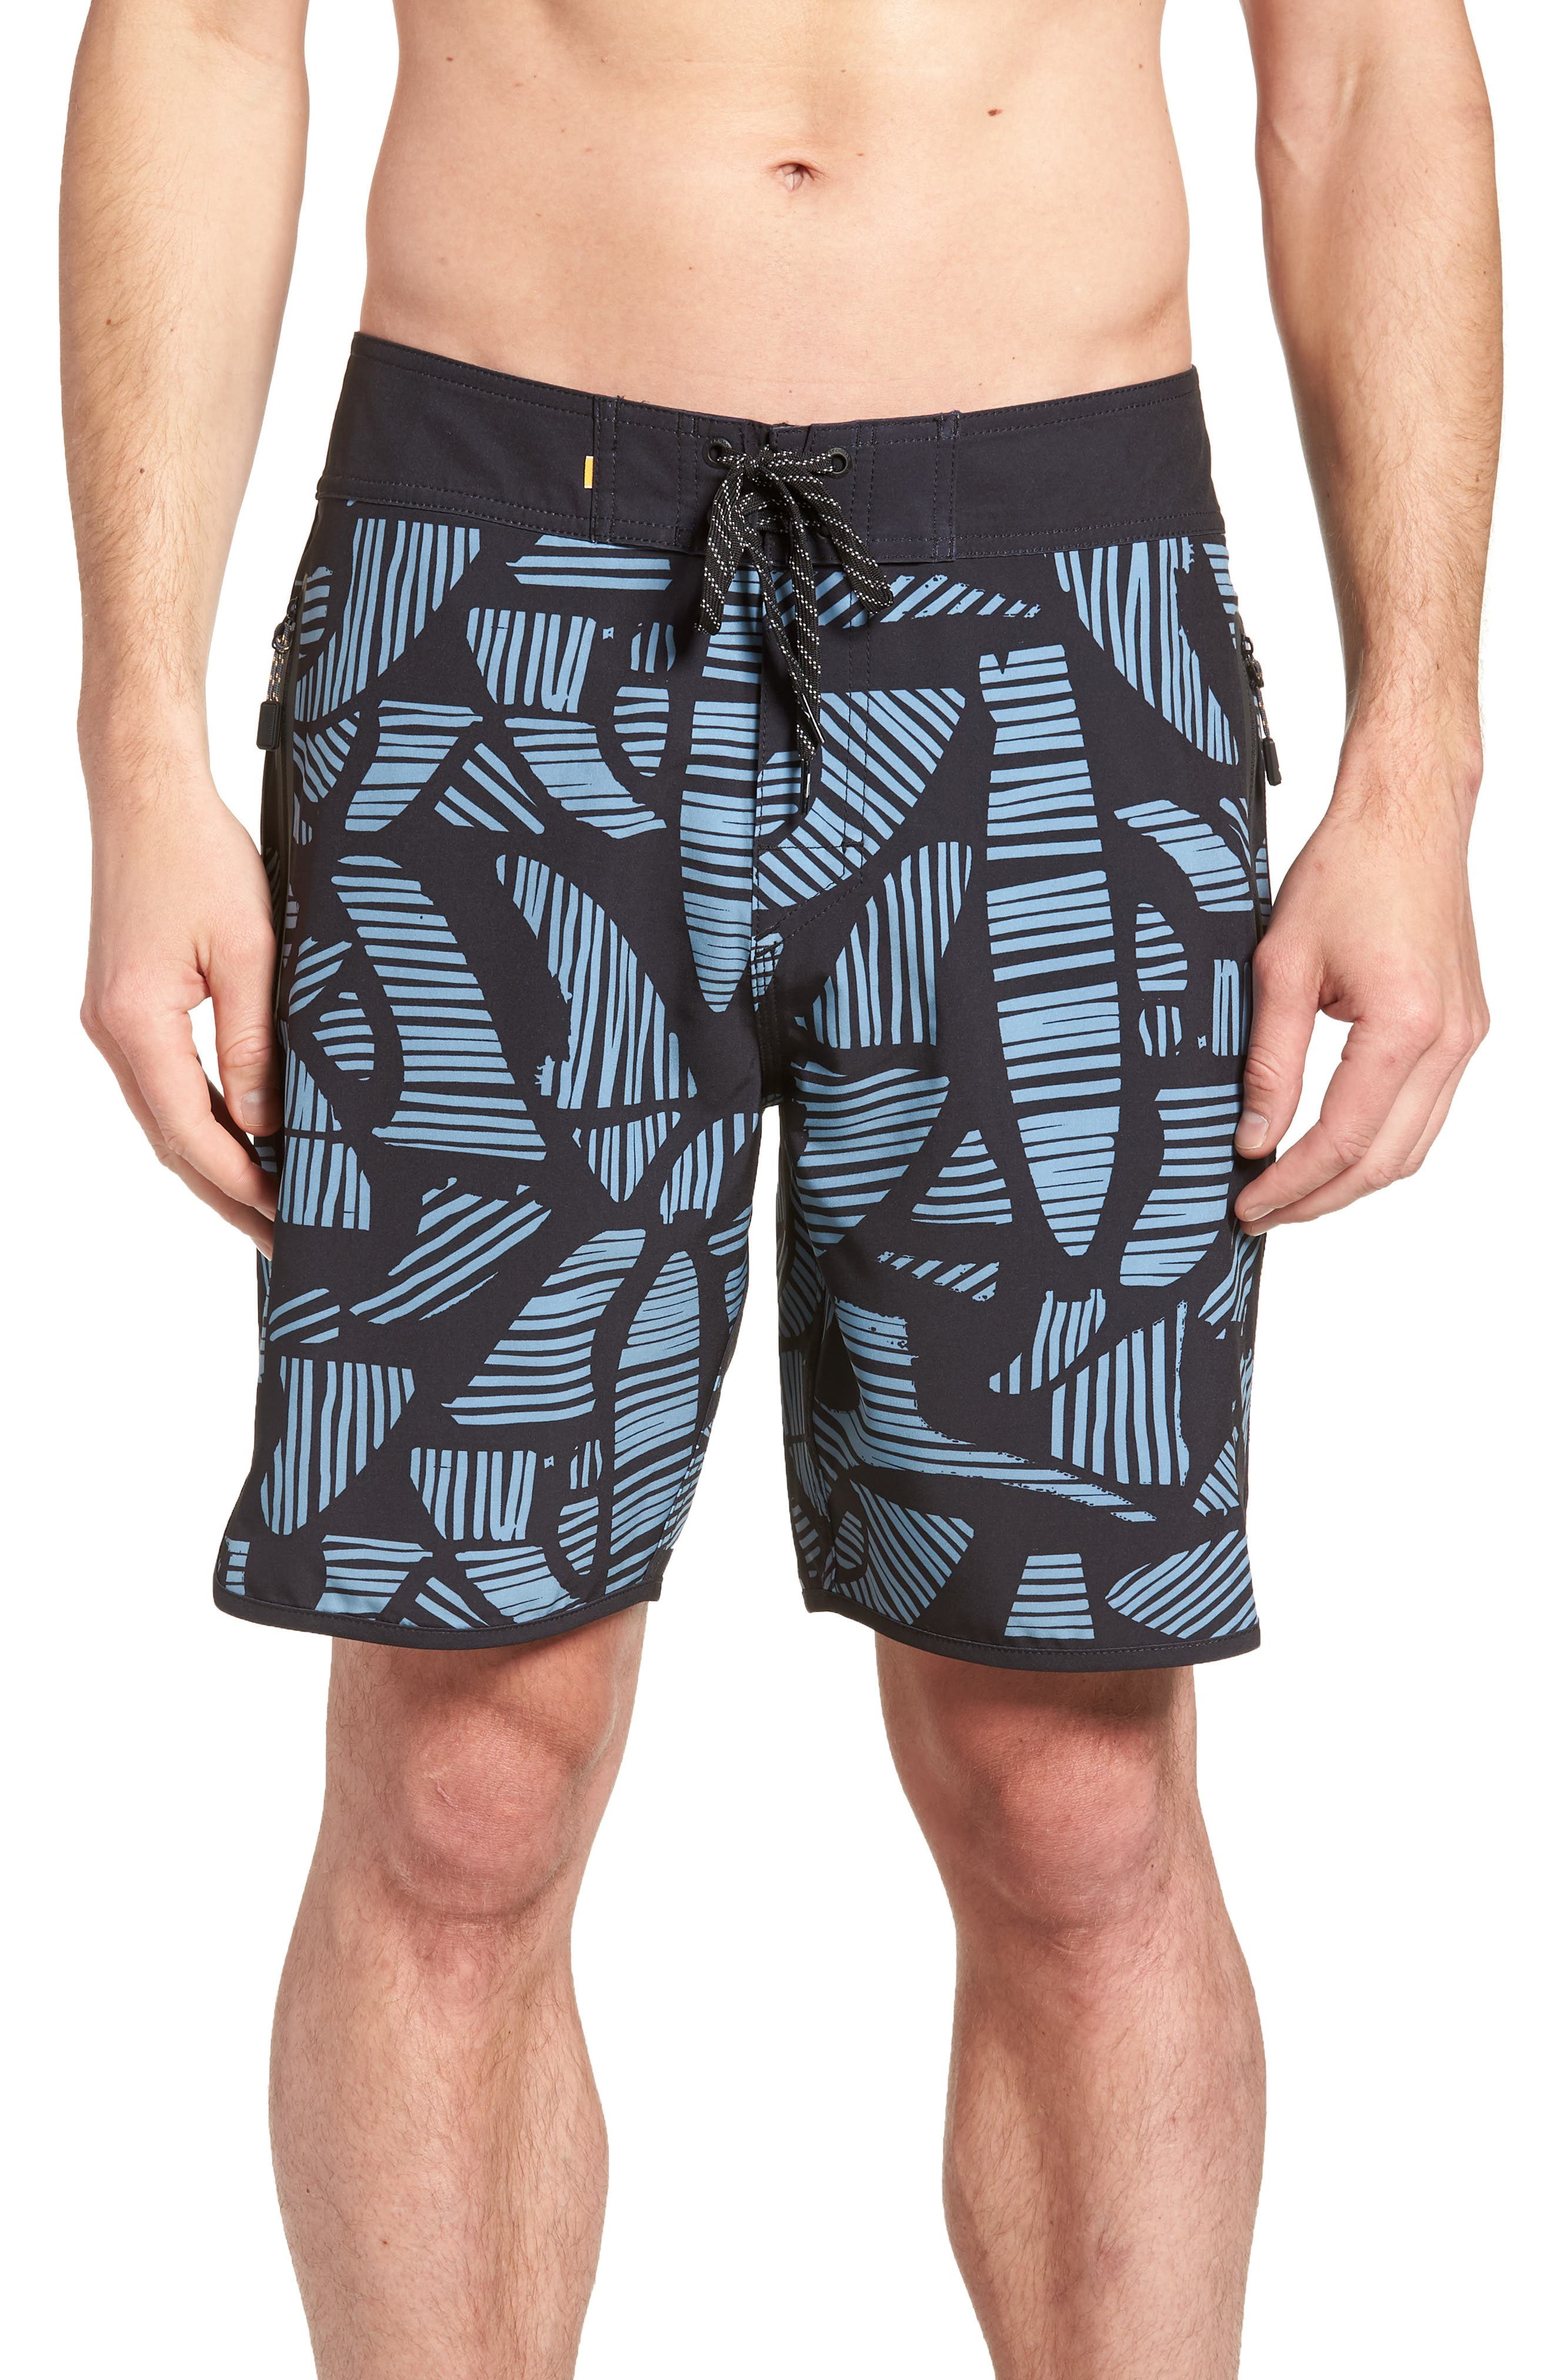 Odysea Board Shorts,                             Main thumbnail 1, color,                             Black